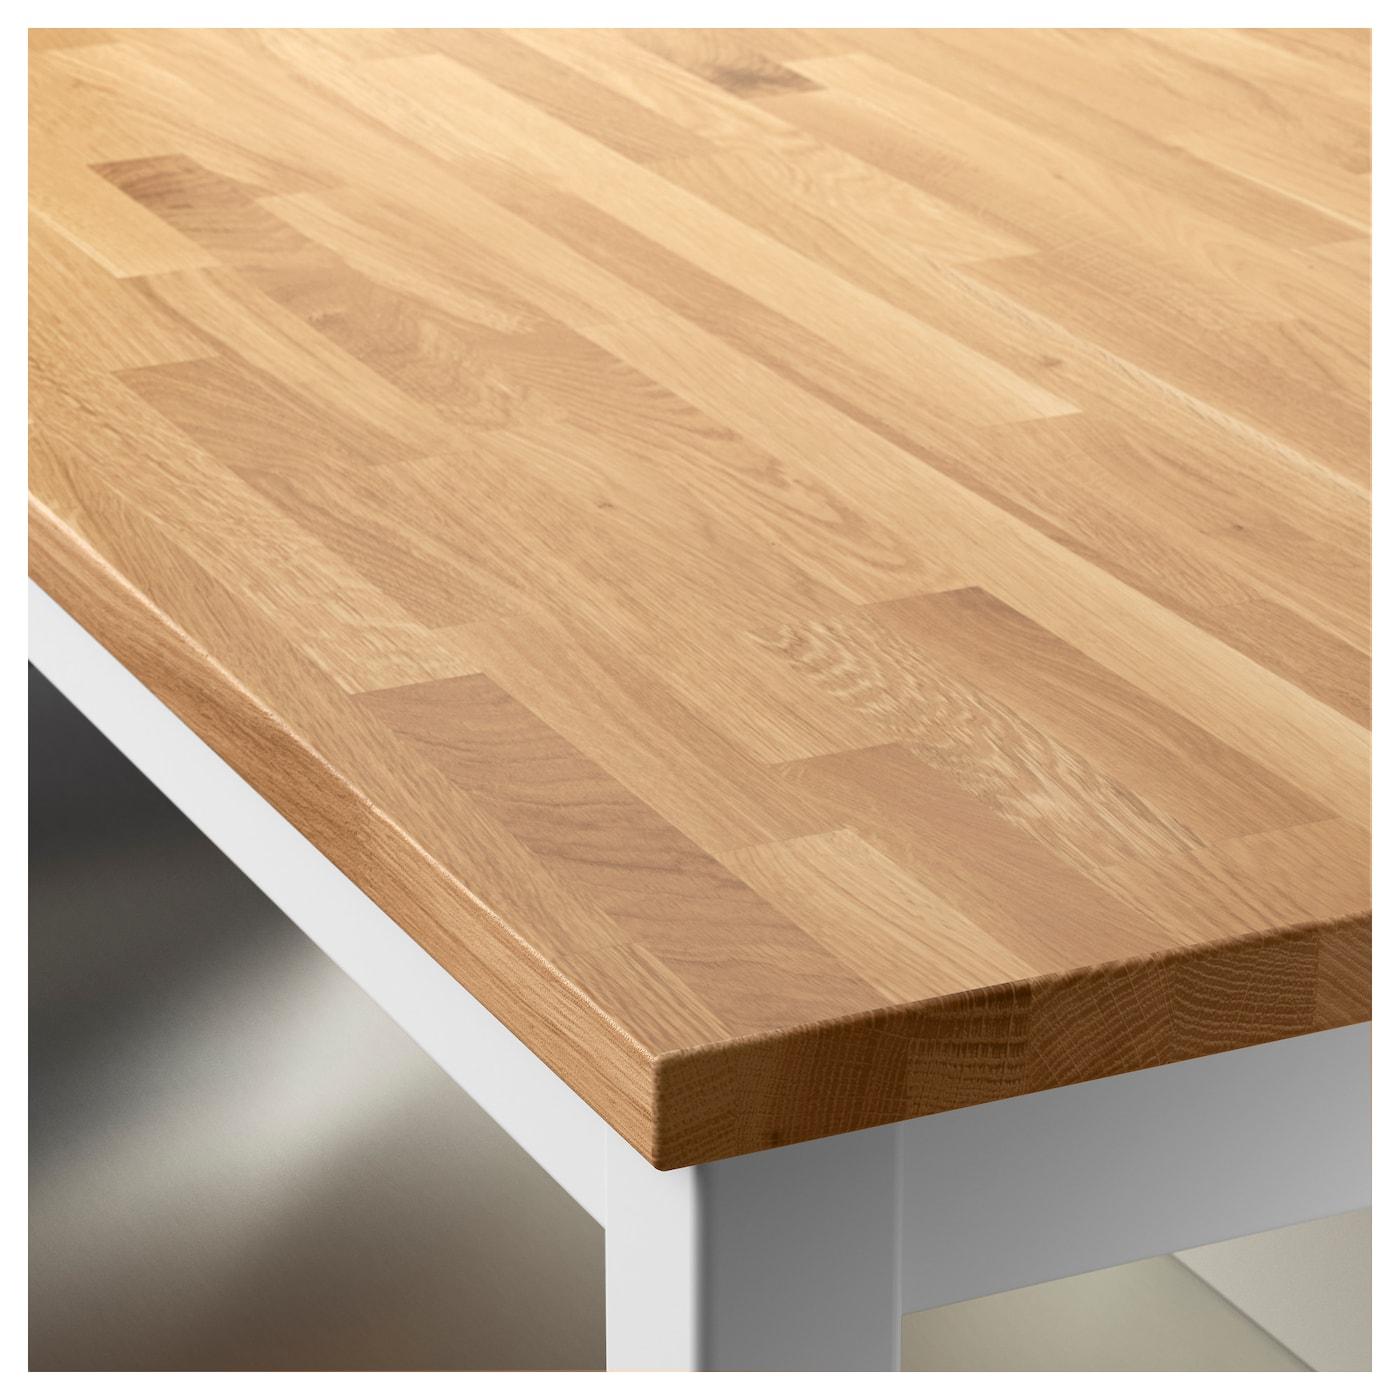 Ikea Kallax High Gloss White ~ Stenstorp Kitchen Island Ikea Free Standing Kitchen Island Easy To